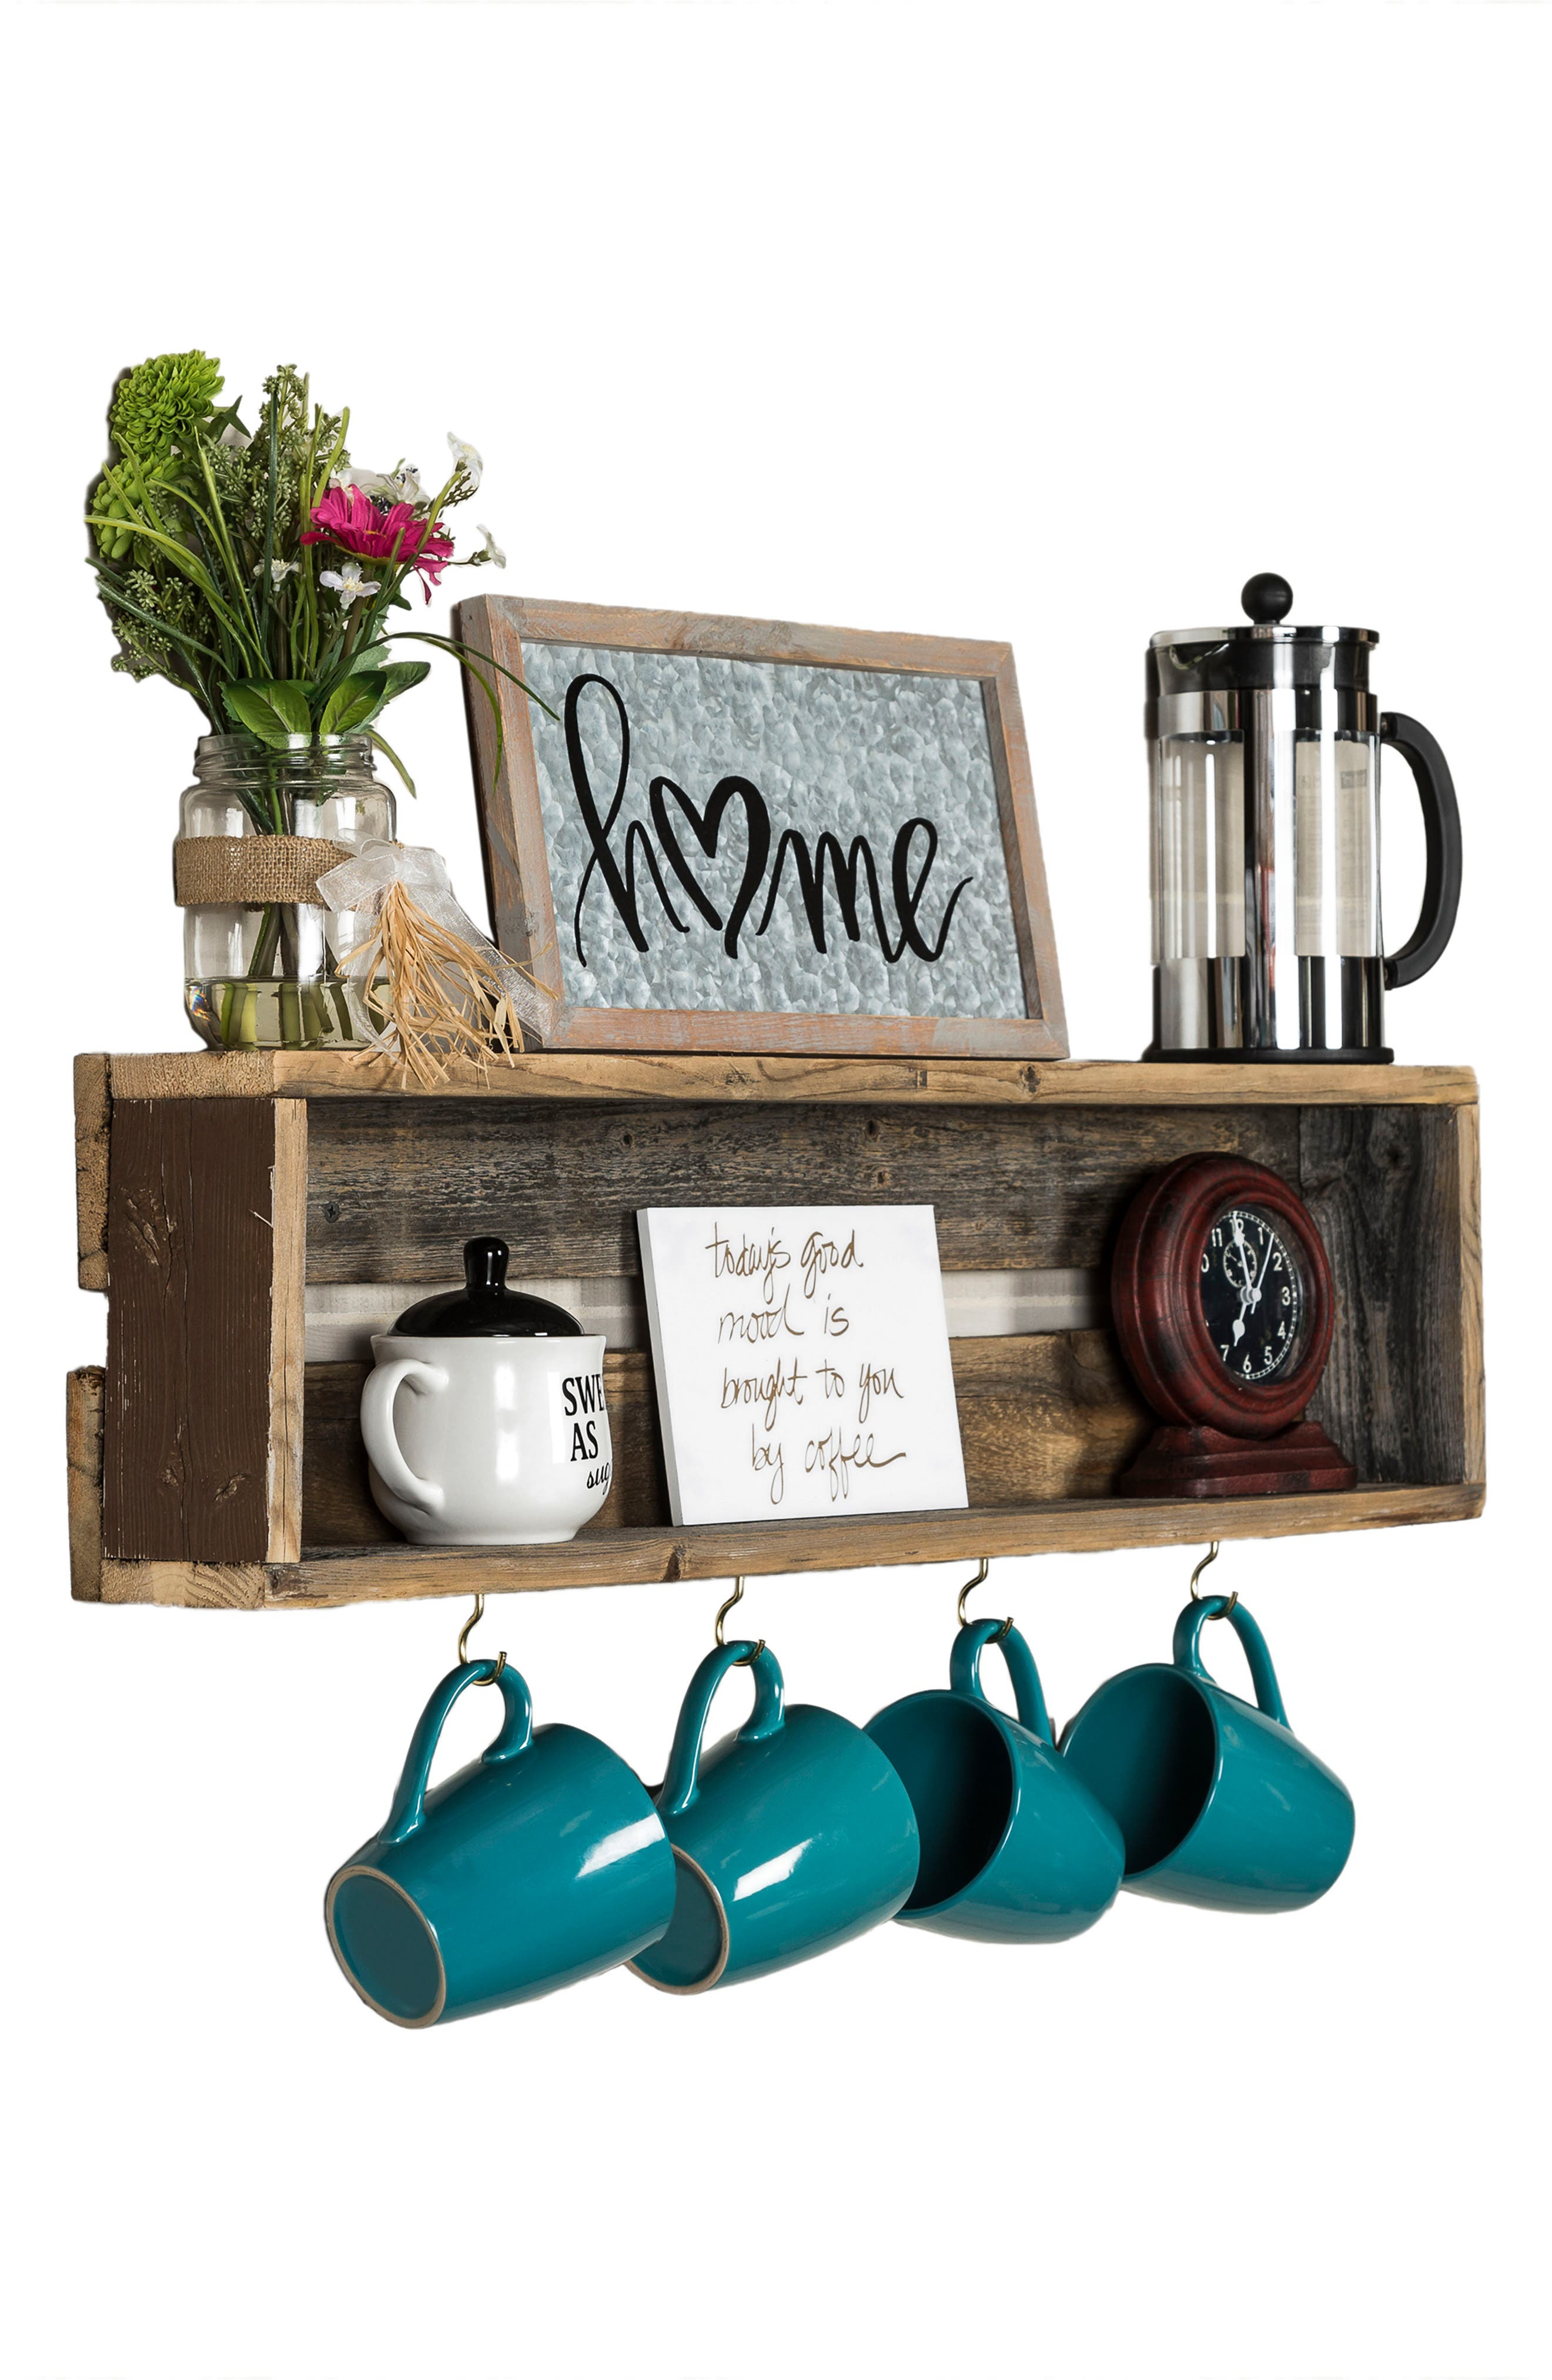 Repurposed Wood Shelf with Hooks,                             Alternate thumbnail 6, color,                             200